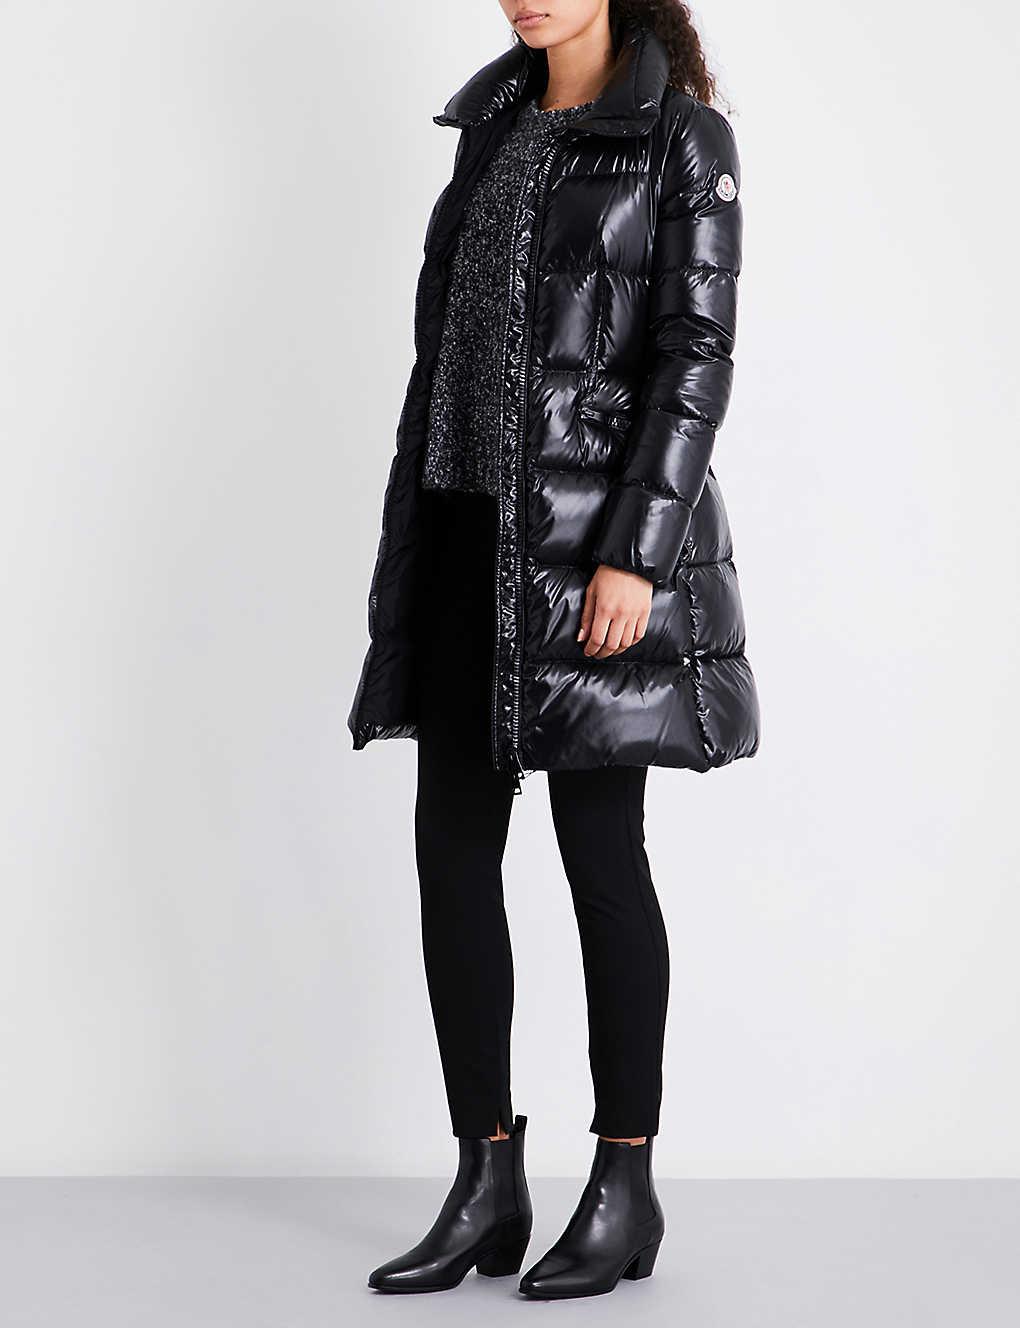 MONCLER Jasminum longline quilted down jacket - Womens Designer Coats - Capes, Trench Coats & MoreSelfridges